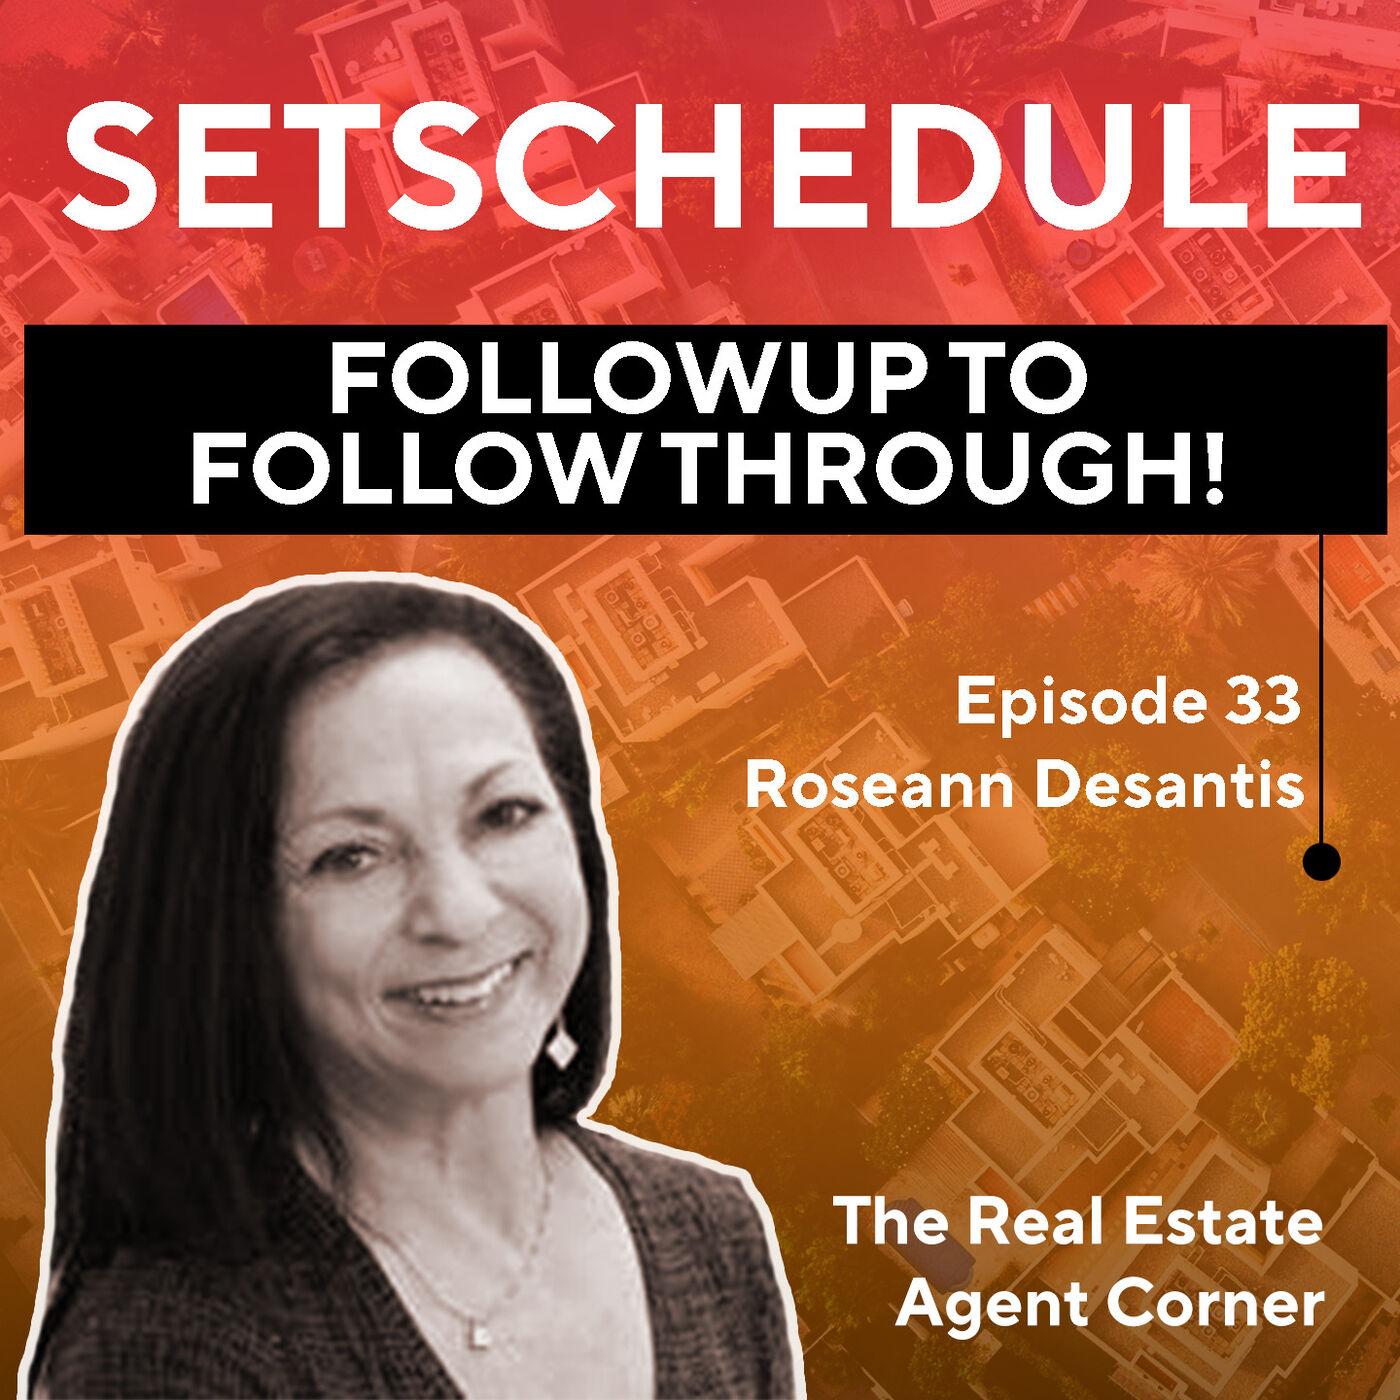 Followup to Follow Through! - Roseann Desantis